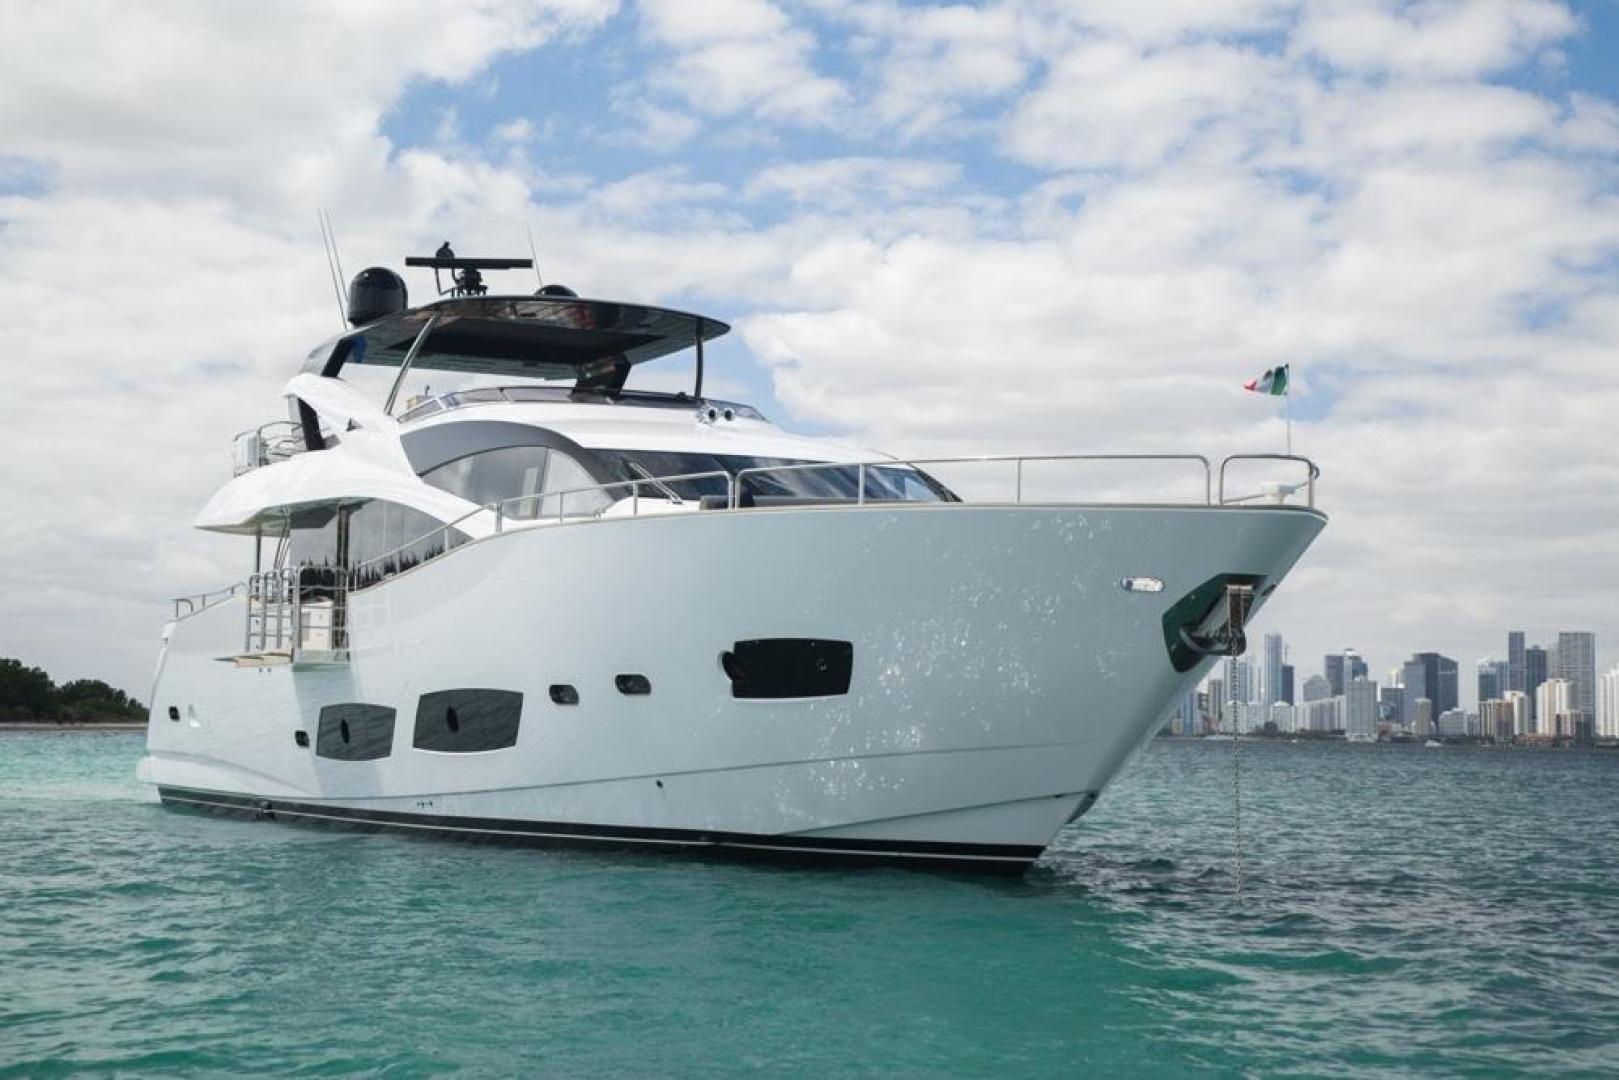 Sunseeker-28 Metre Yacht 2016-RIII Miami-Florida-United States-600080 | Thumbnail